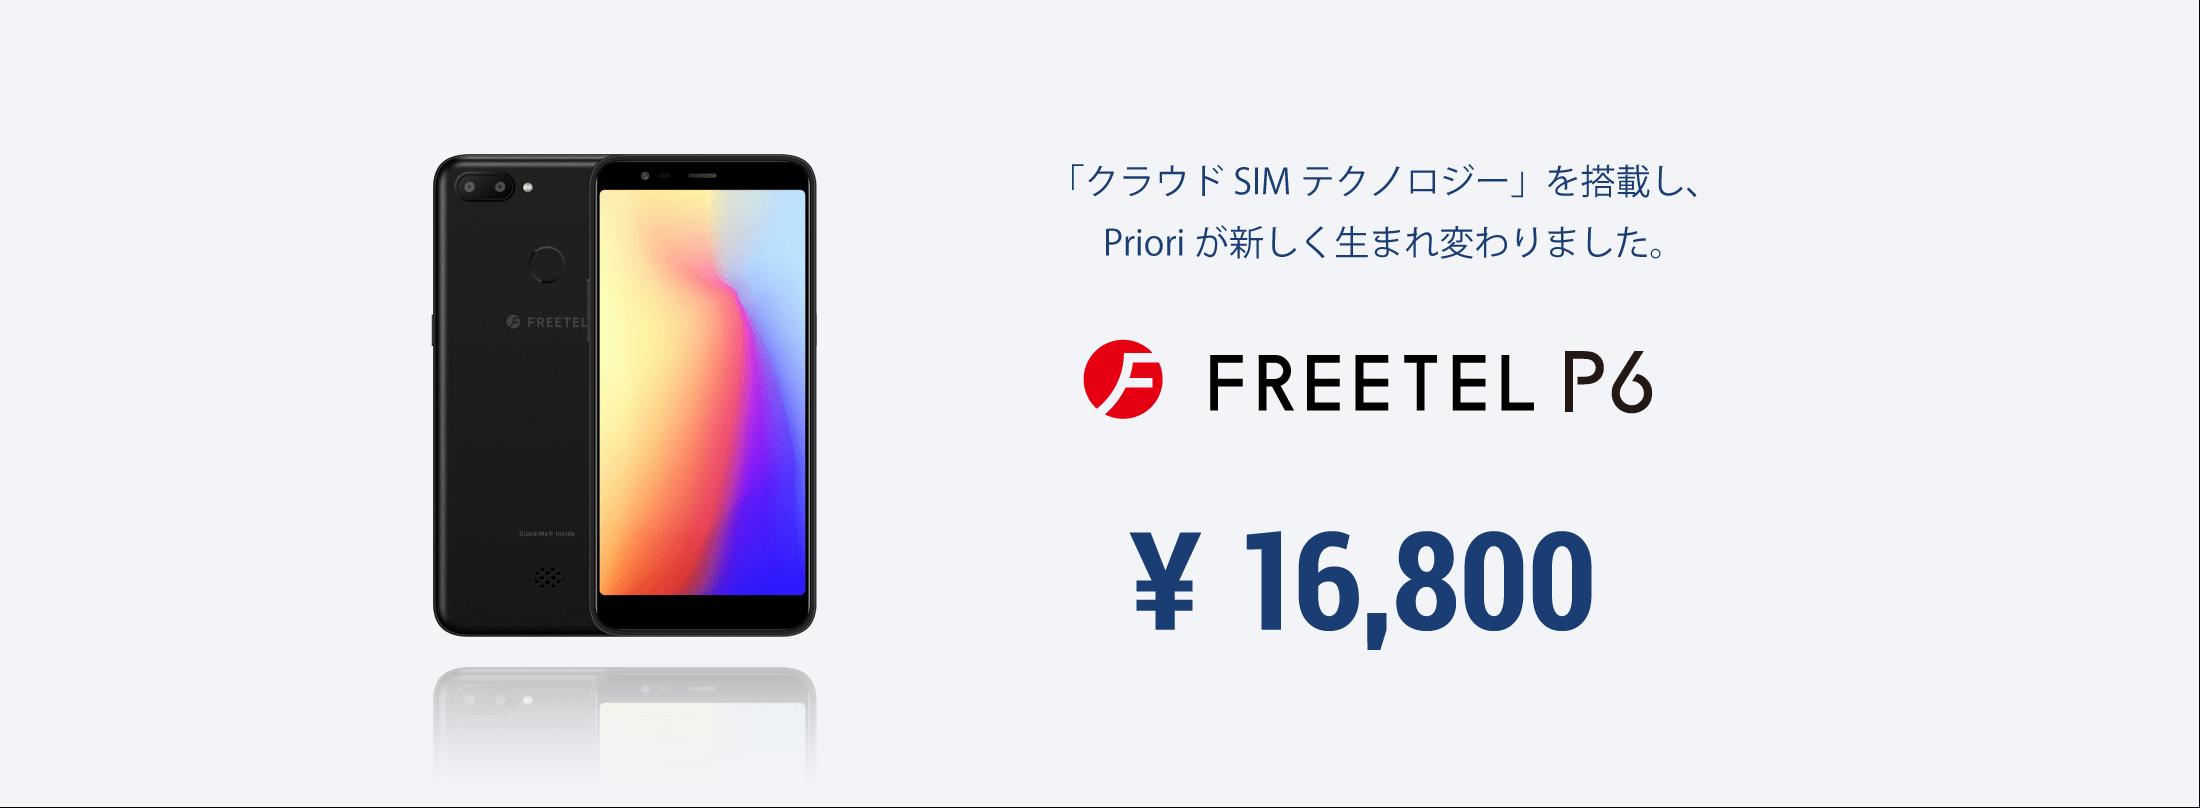 FREETEL P6